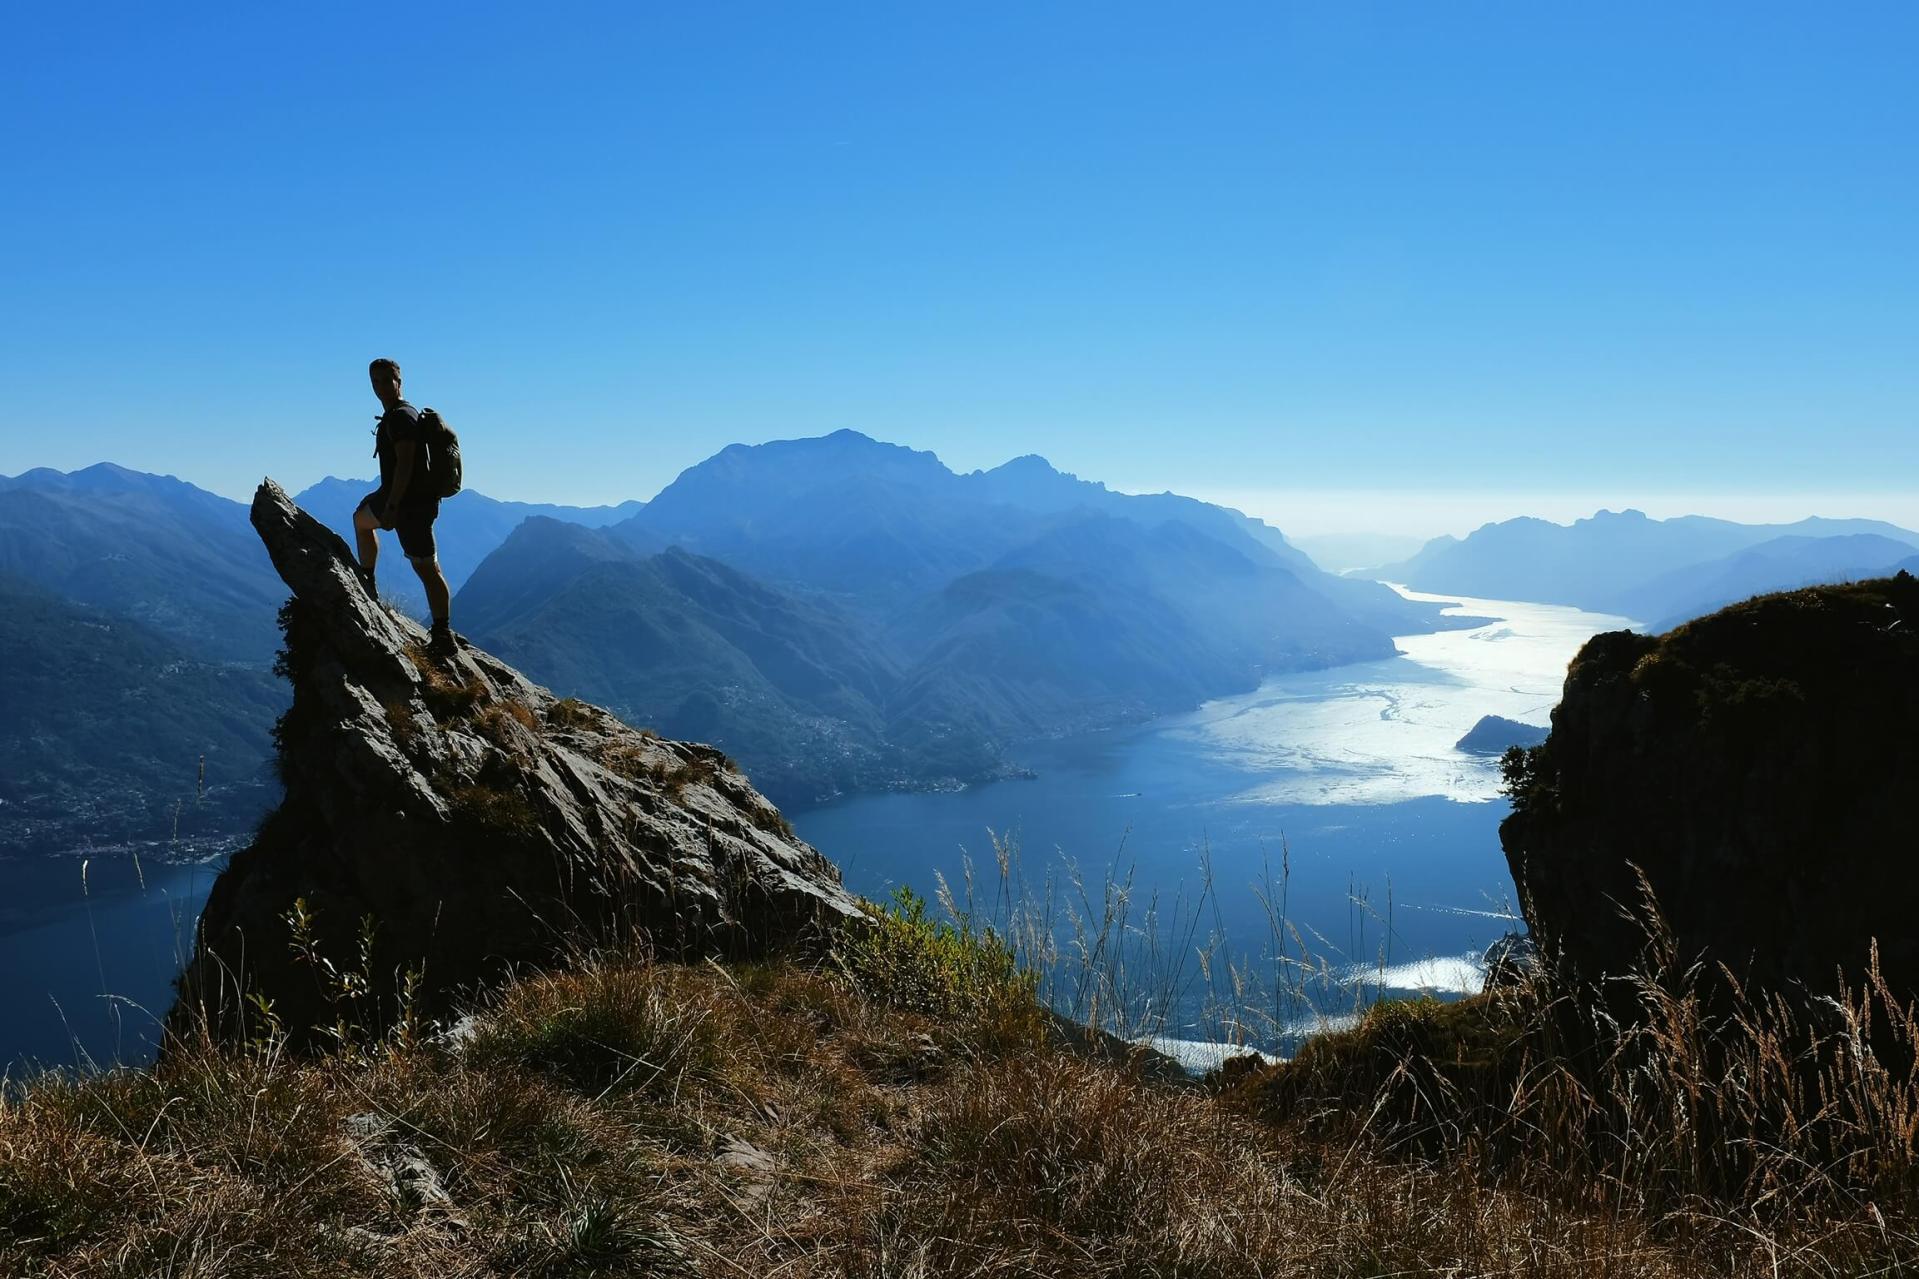 Celebrating love at Lake Como